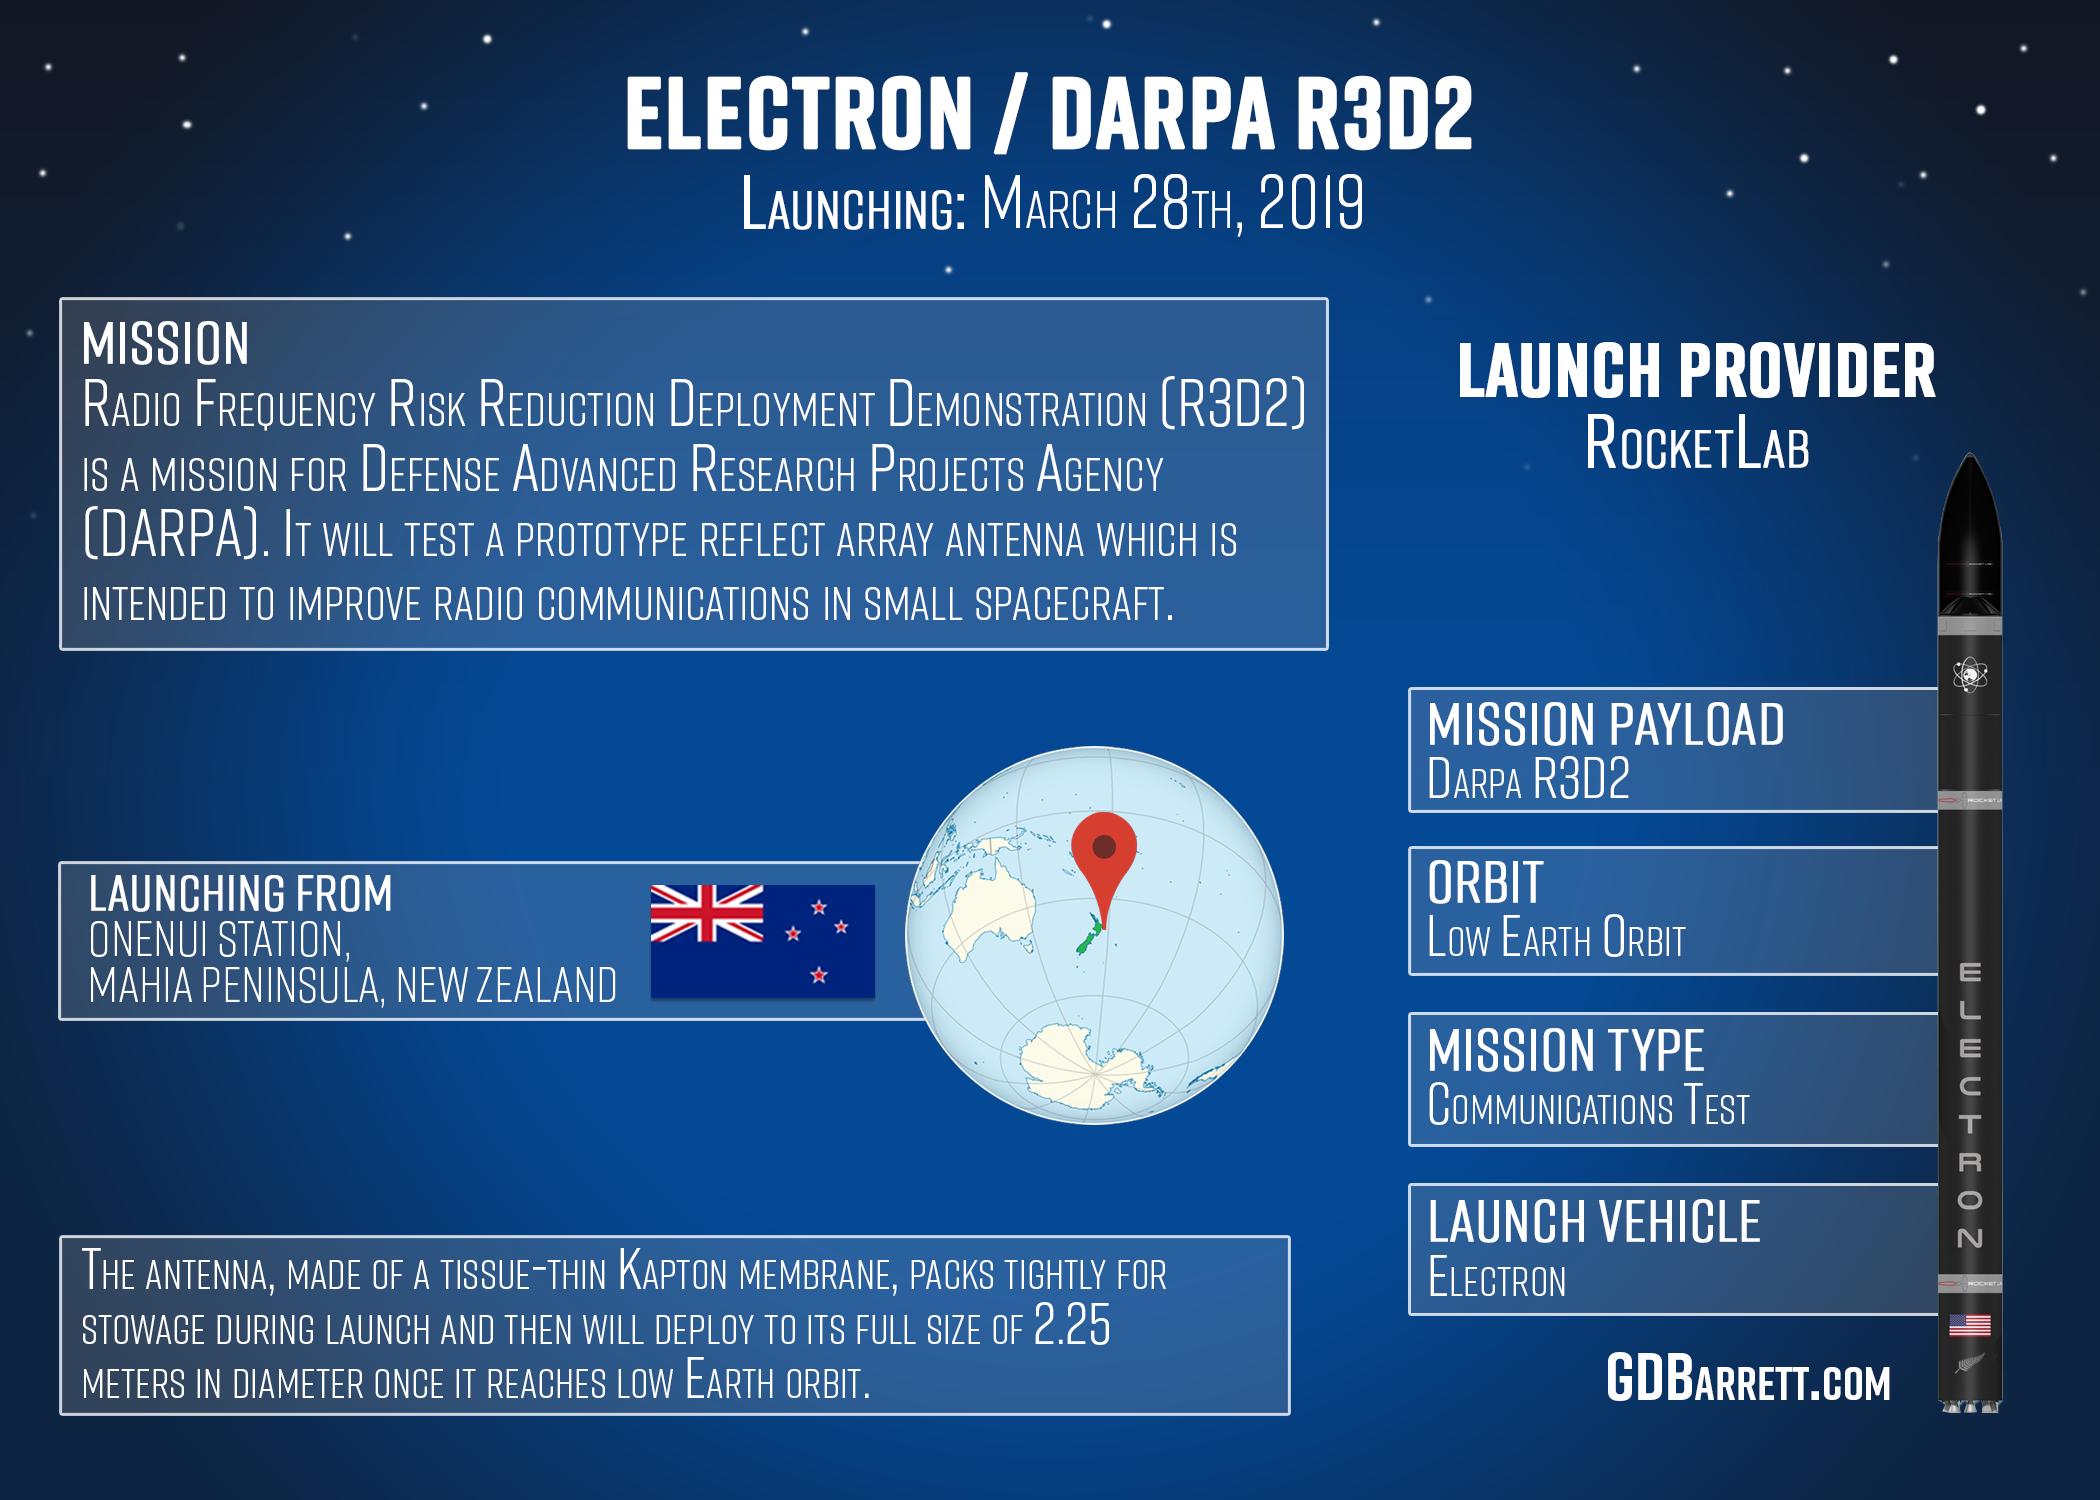 RocketLab Electron / Darpa R3D2